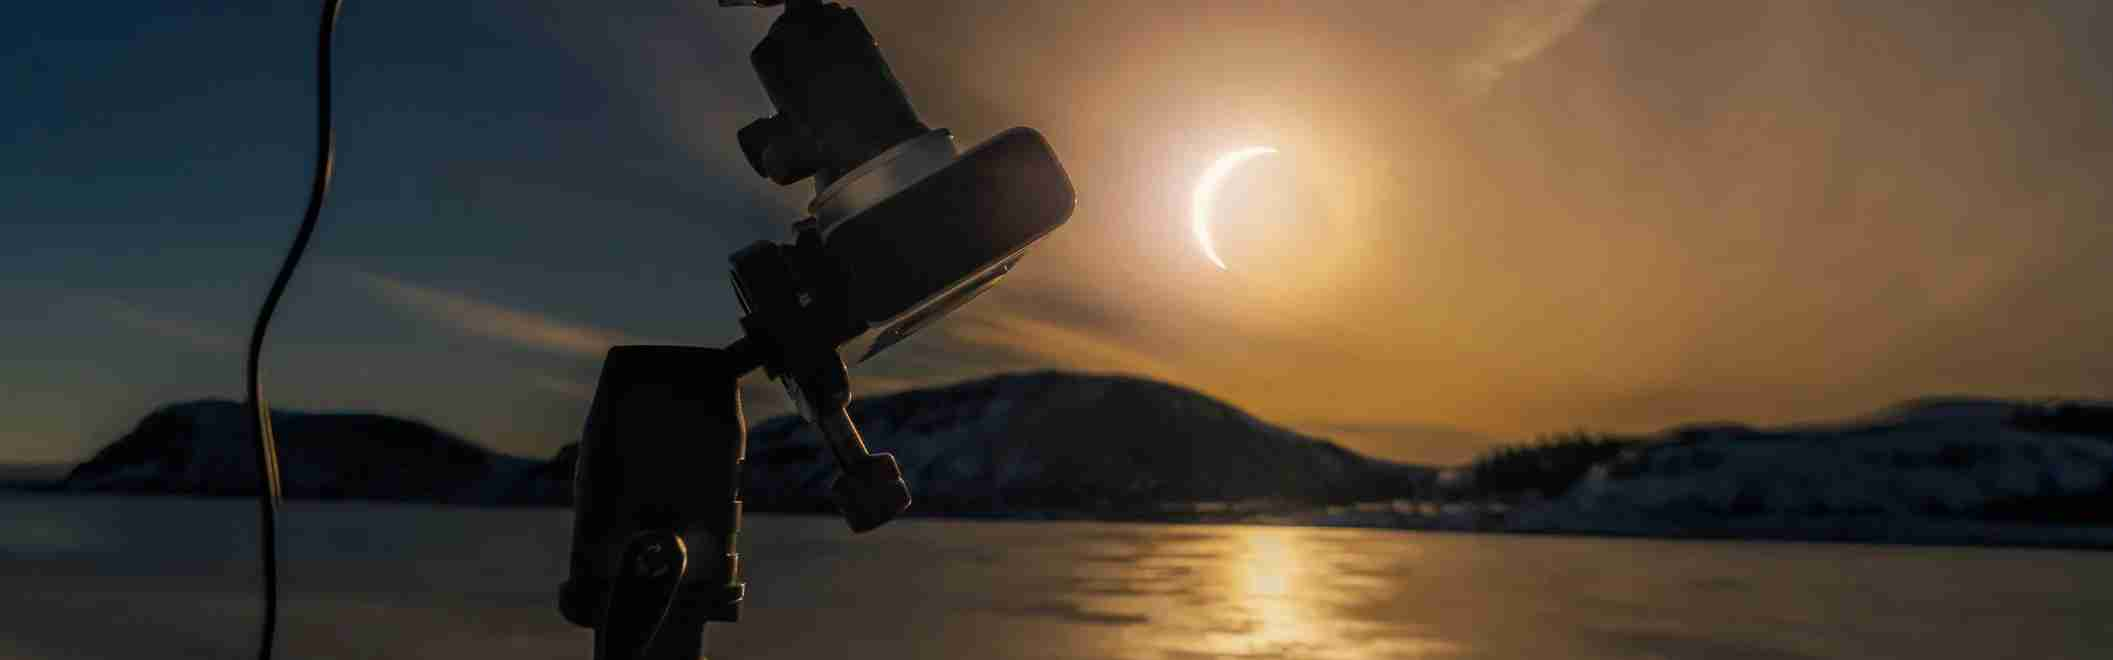 Solar eclipse, Thingvellir National Park, Iceland.